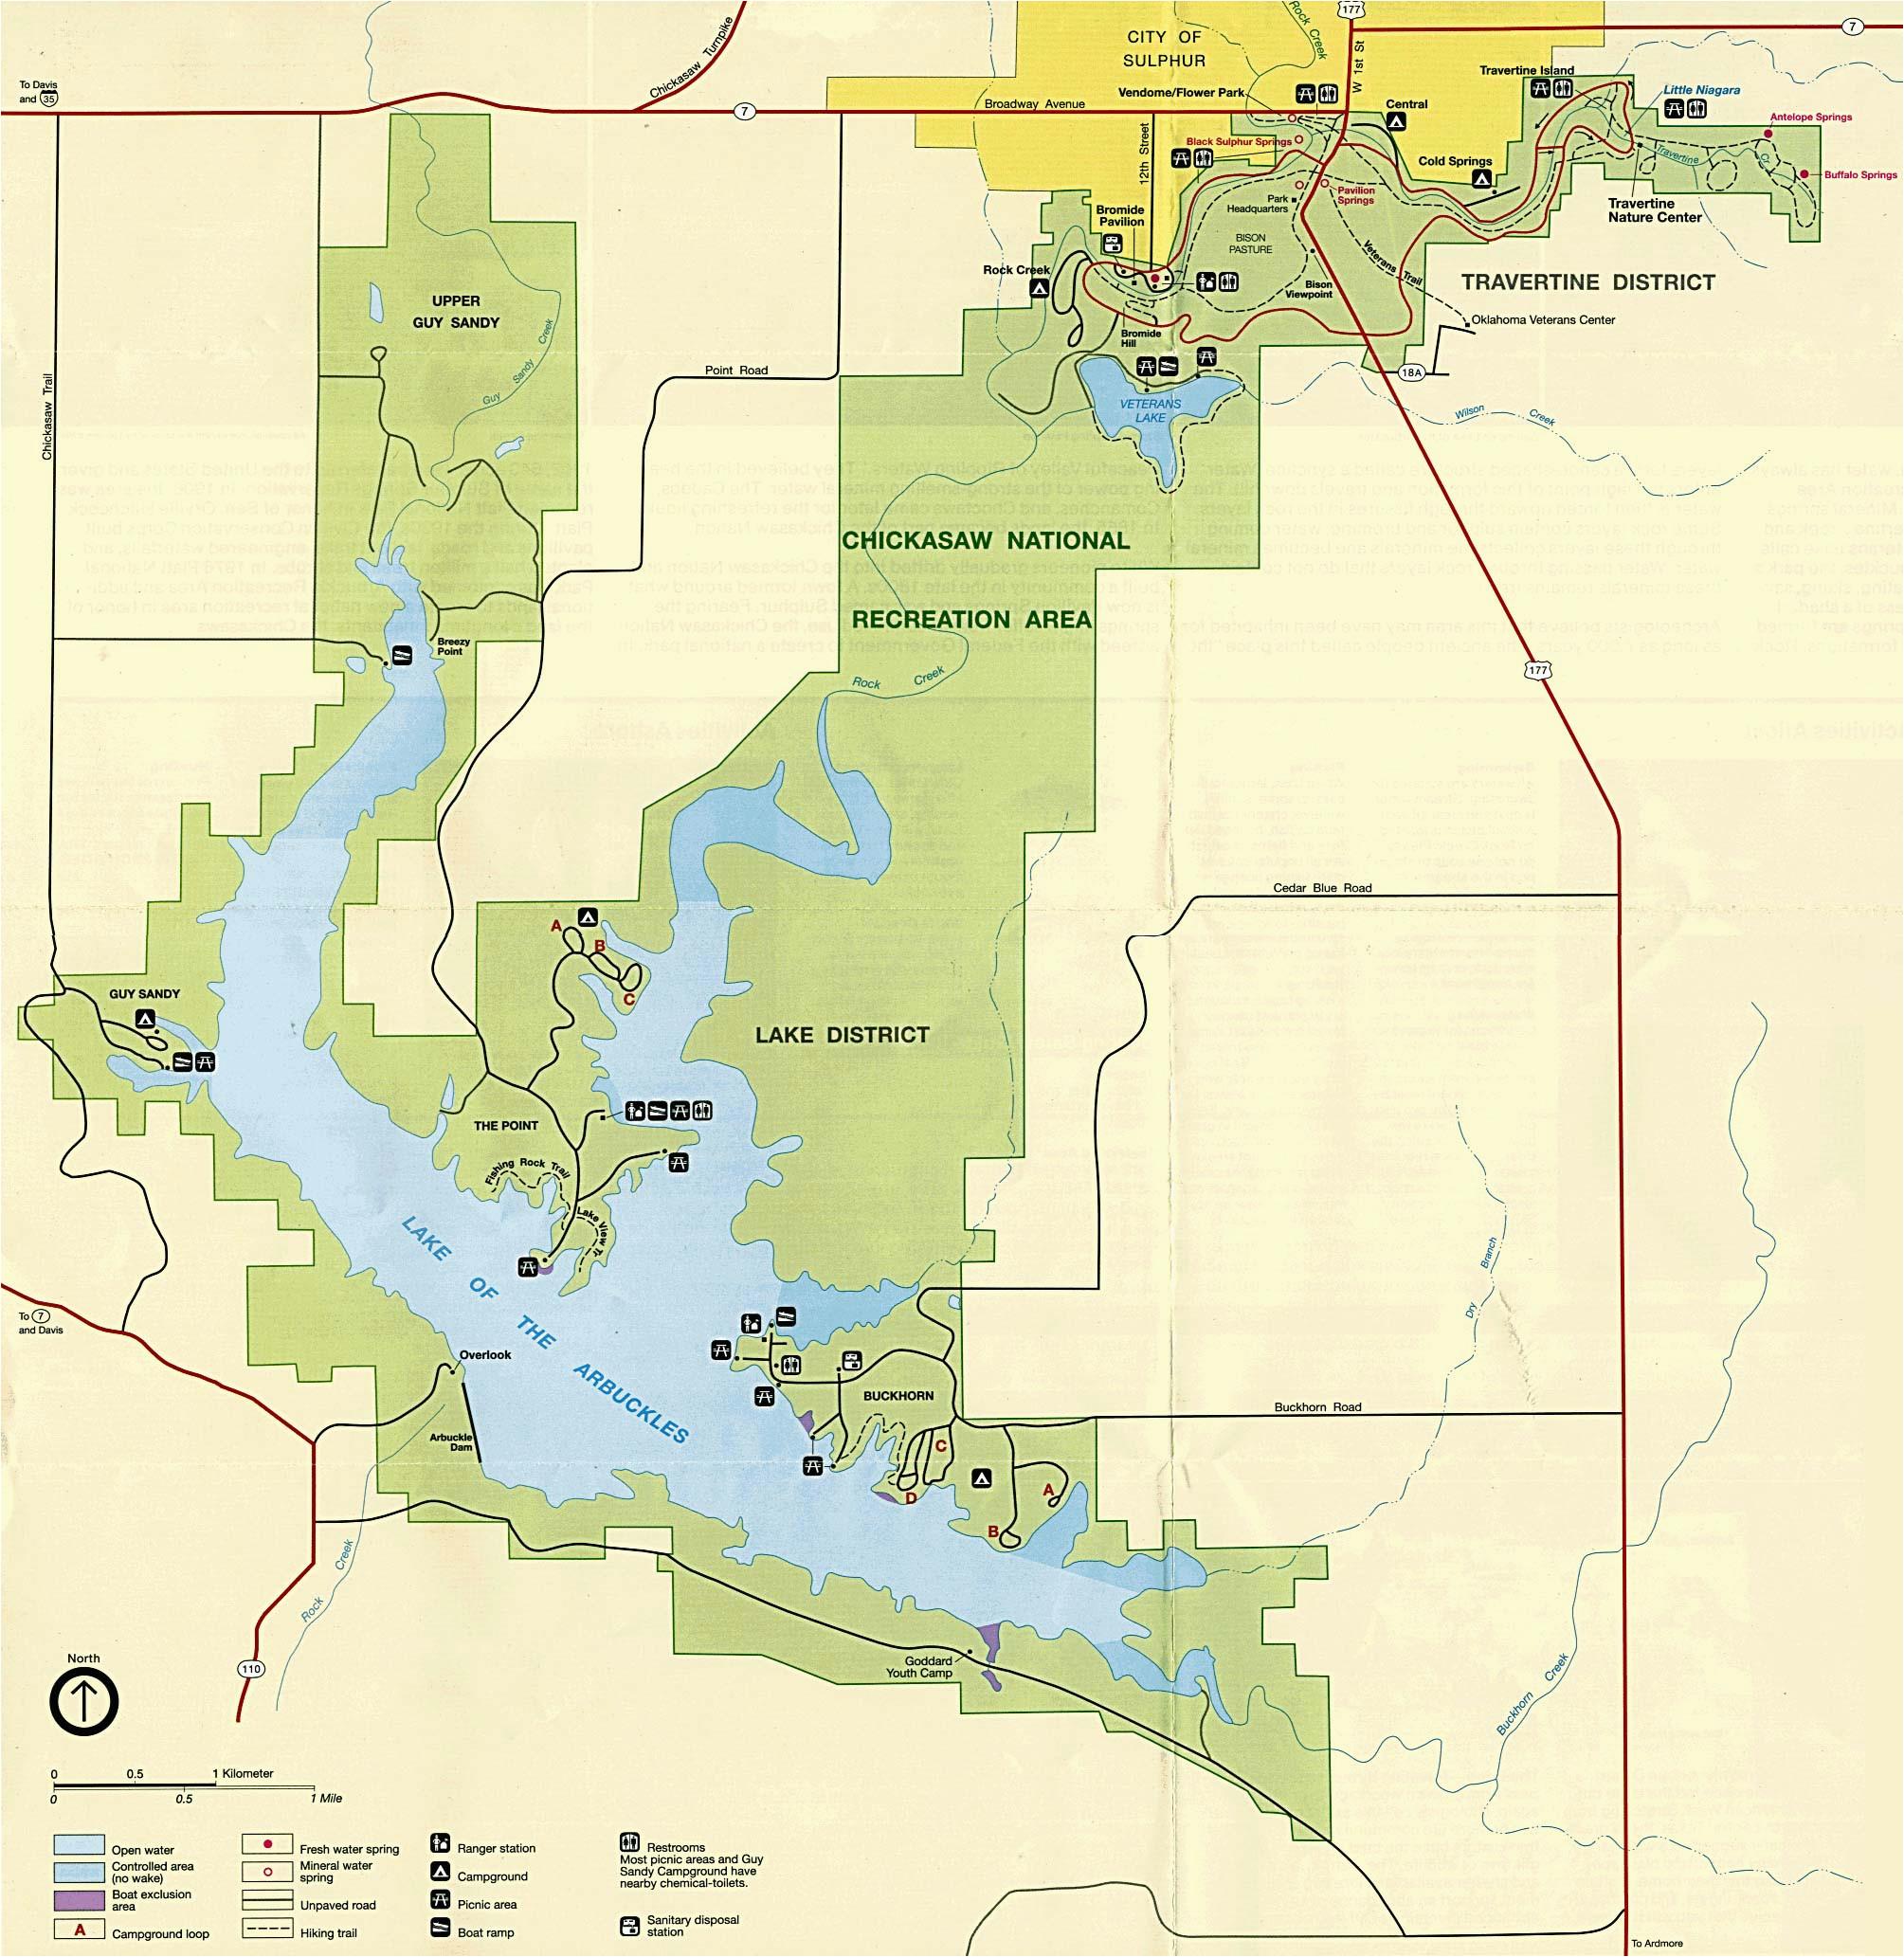 south carolina state parks map elegant maps of united states